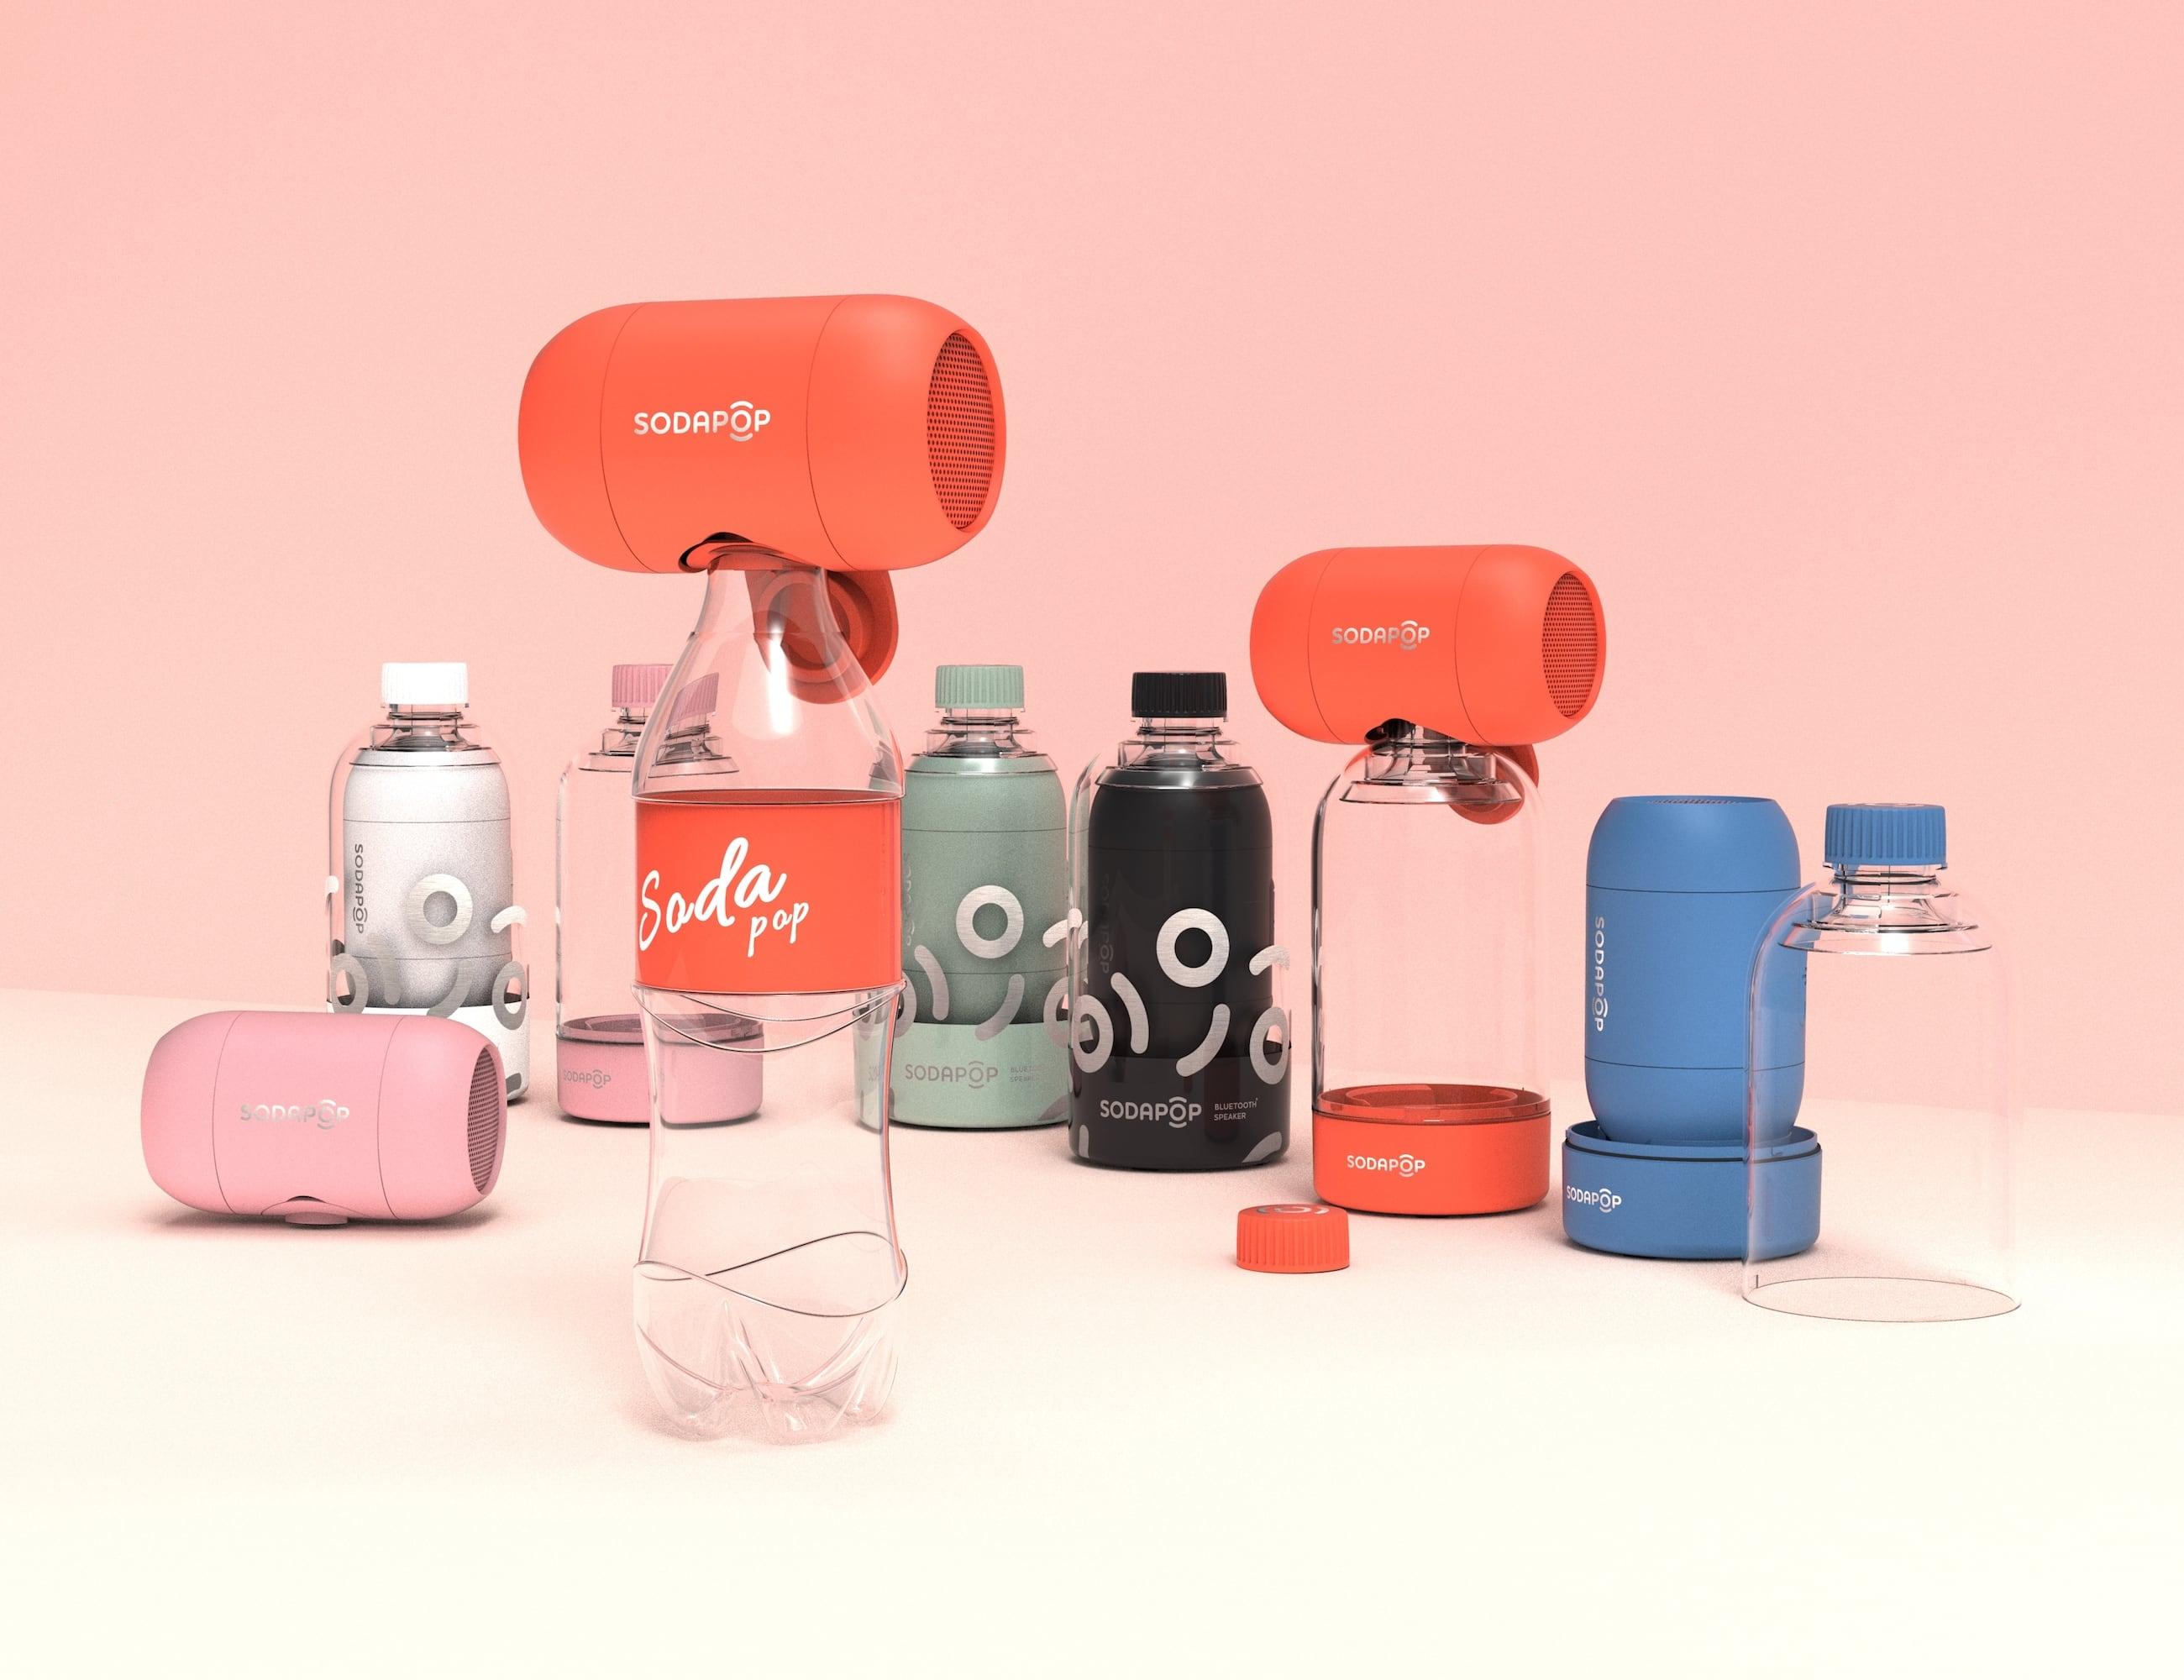 Sodapop Portable Expandable Bass Speaker